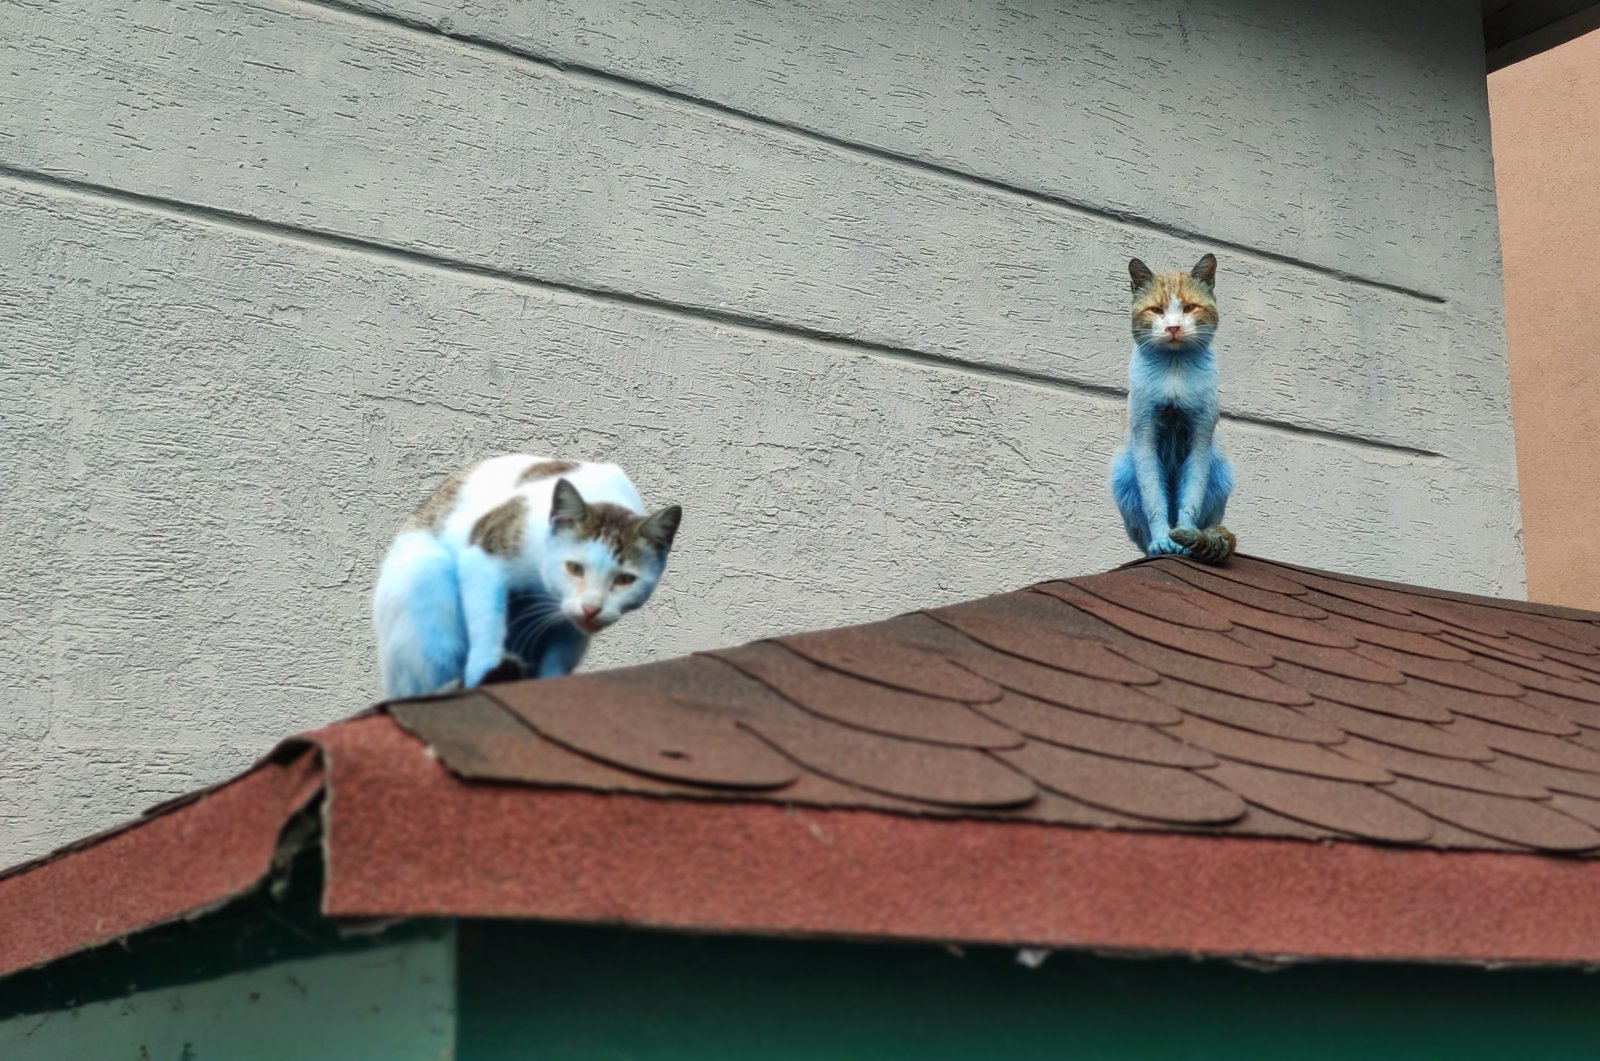 The blue cats spotted in Istanbul's Küçükçekmece distrcit were likened to smurfs by locals, Oct. 19, 2020. (IHA Photo)